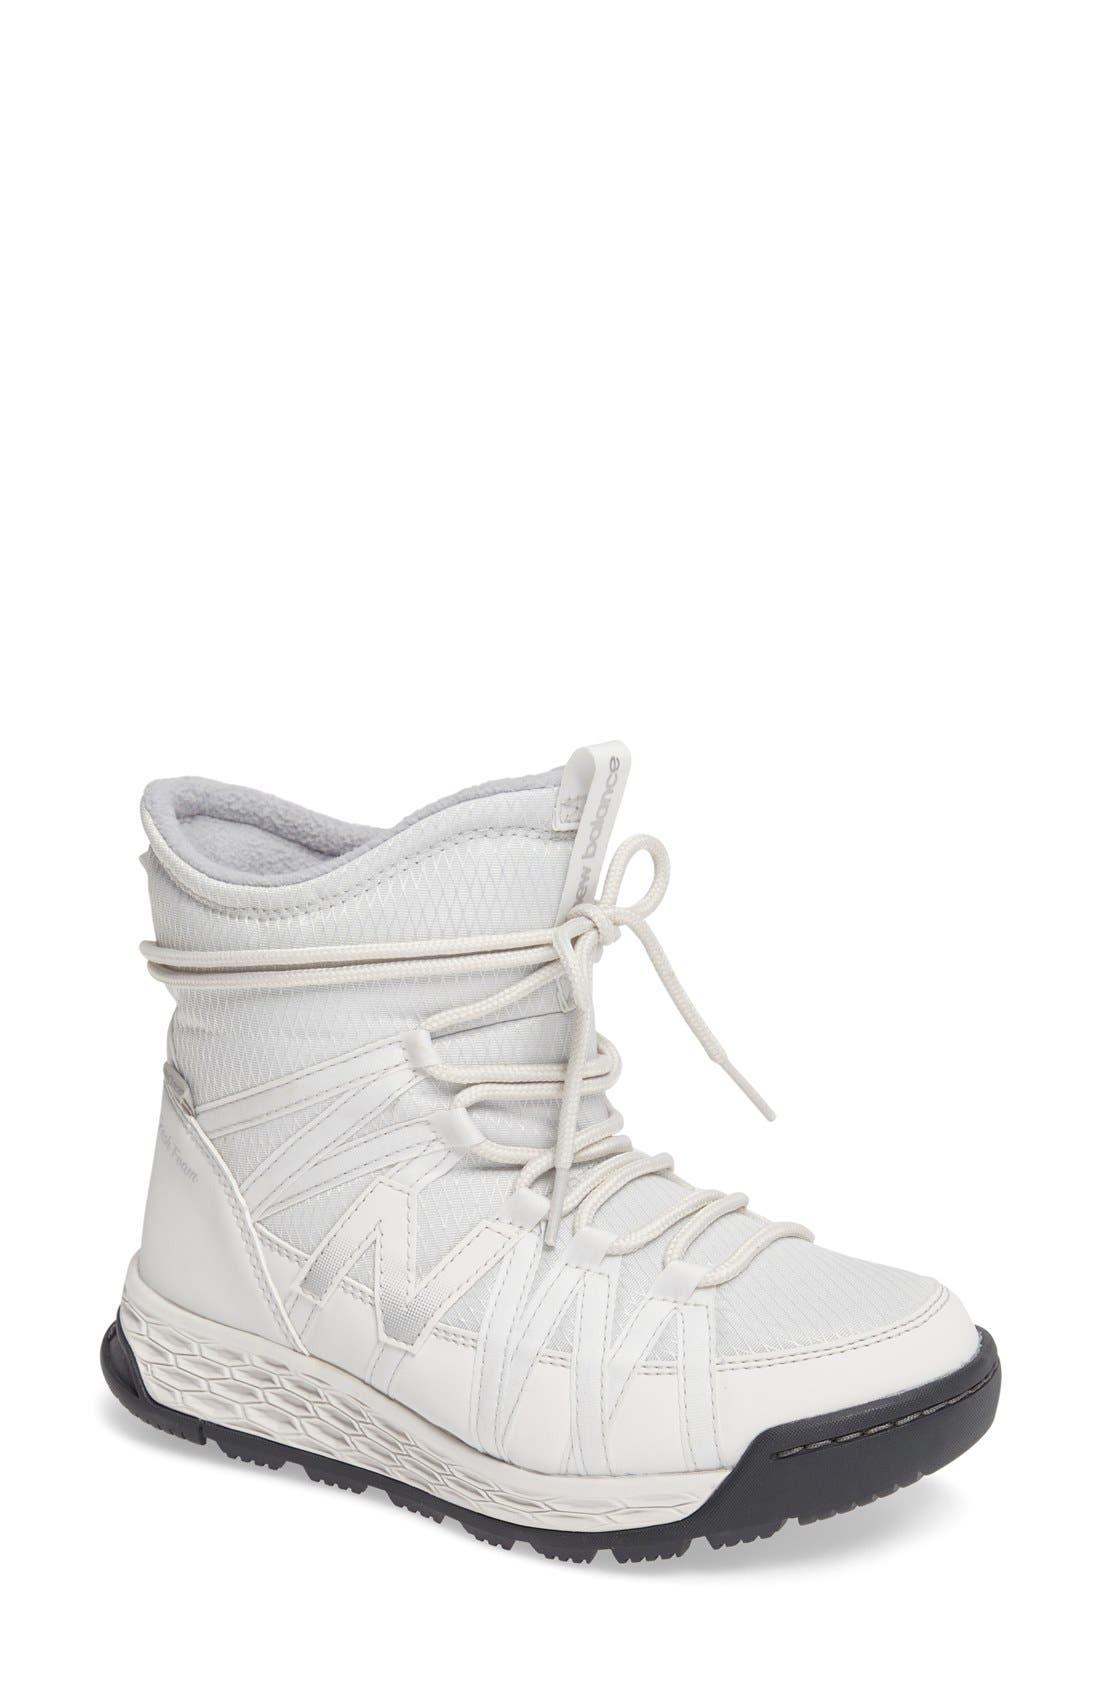 new balance womens boots